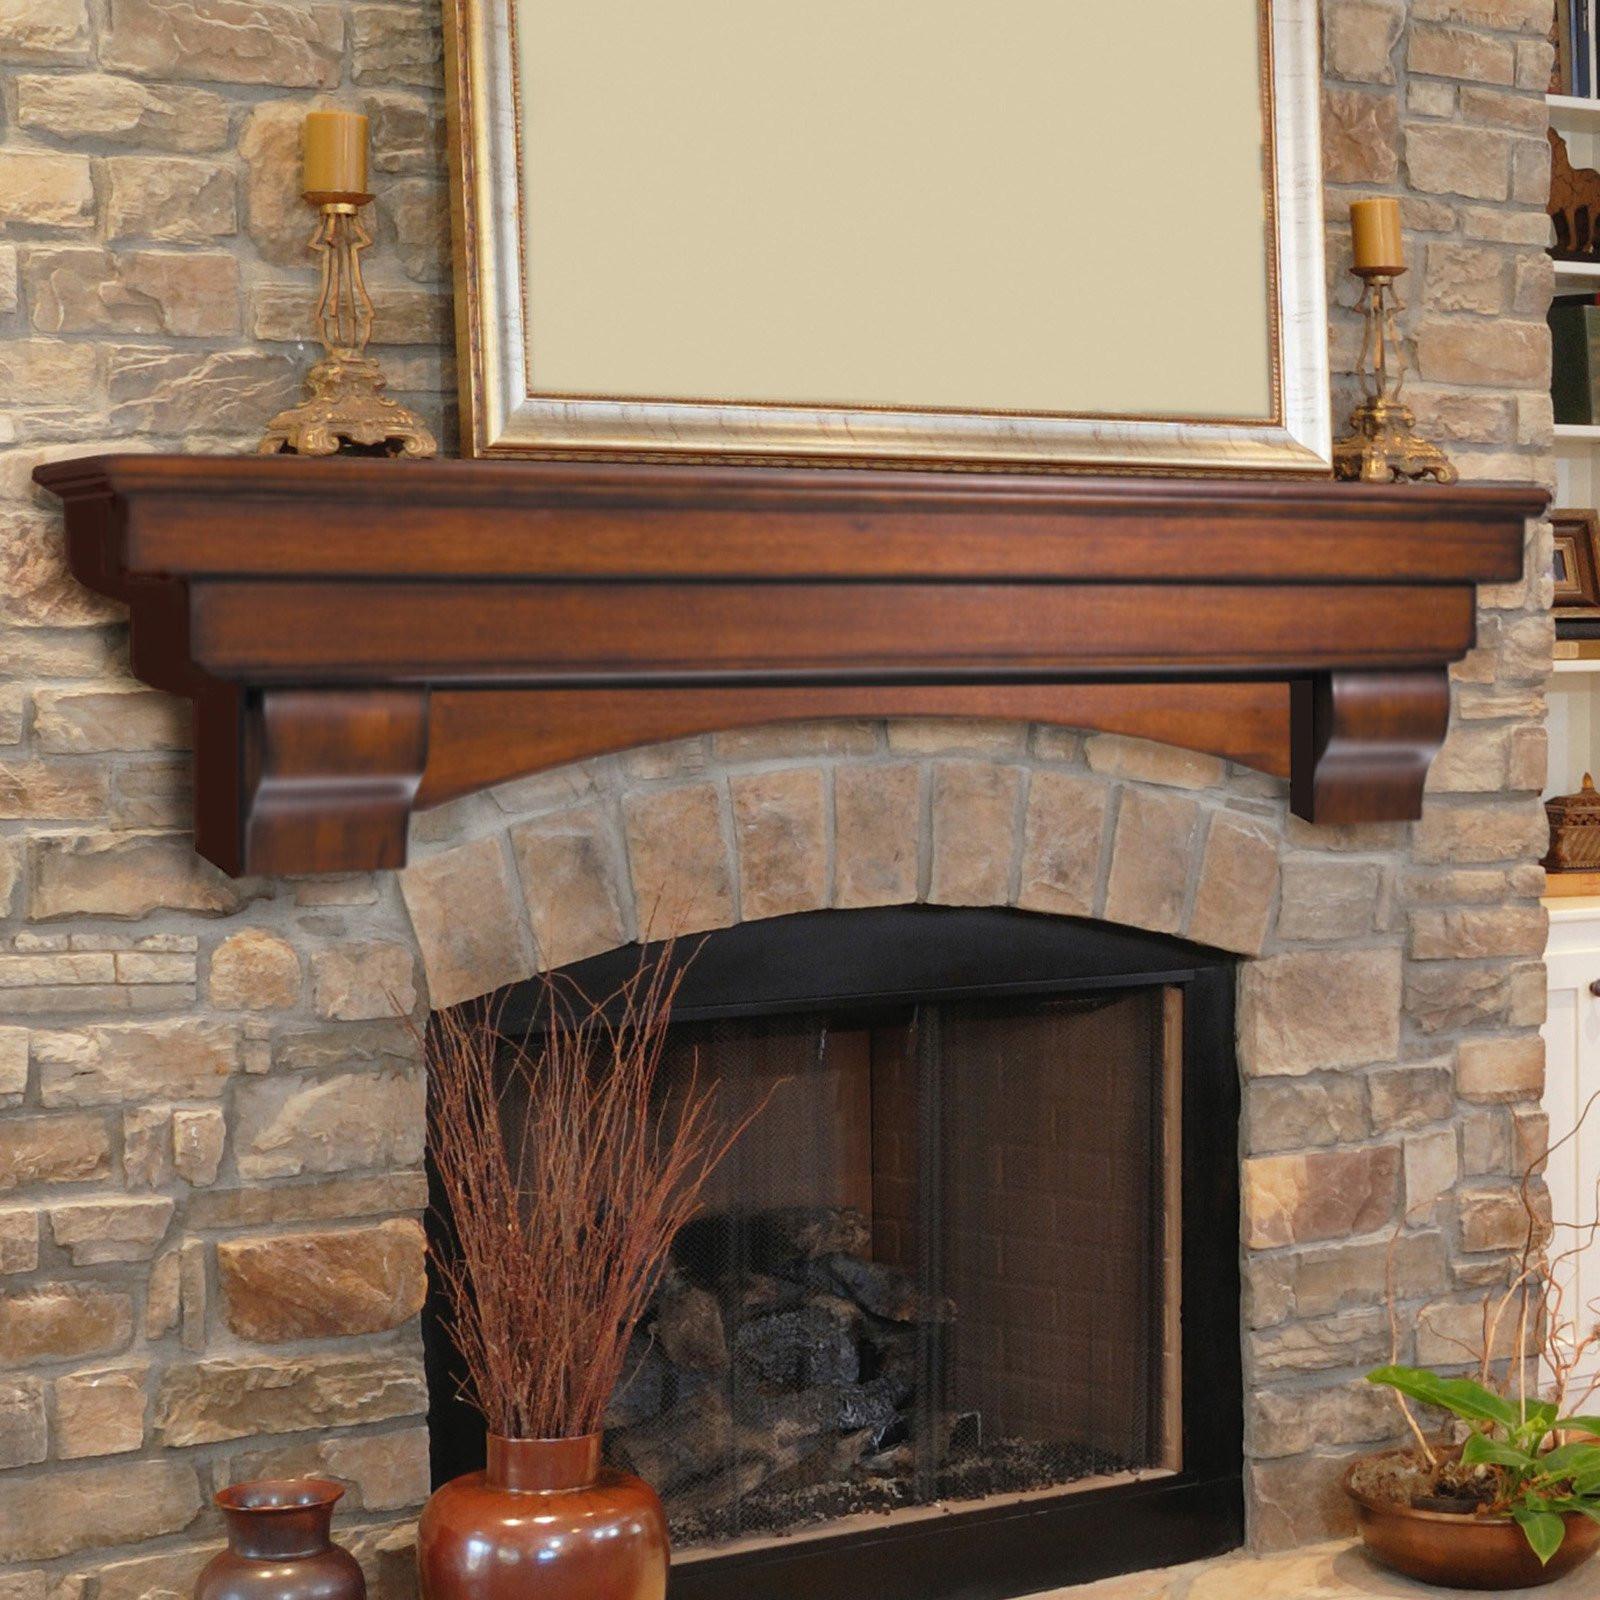 Best ideas about Fireplace Mantel Shelf . Save or Pin Pearl Mantels Auburn Traditional Fireplace Mantel Shelf Now.